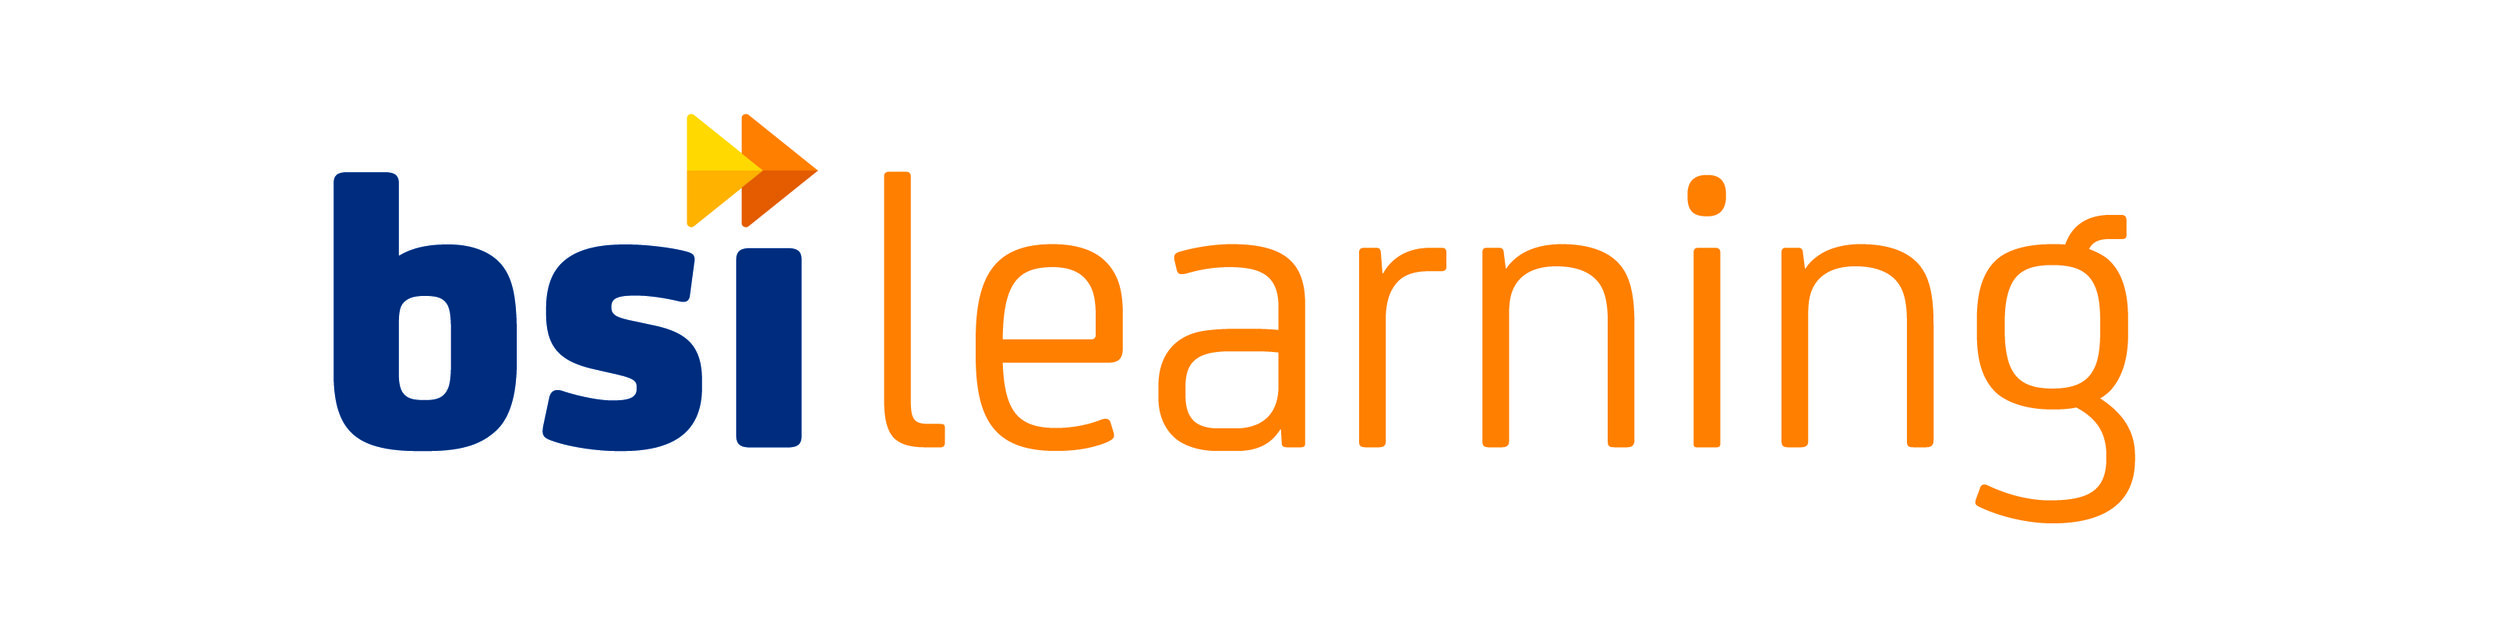 BSI Learning_Colour.jpg